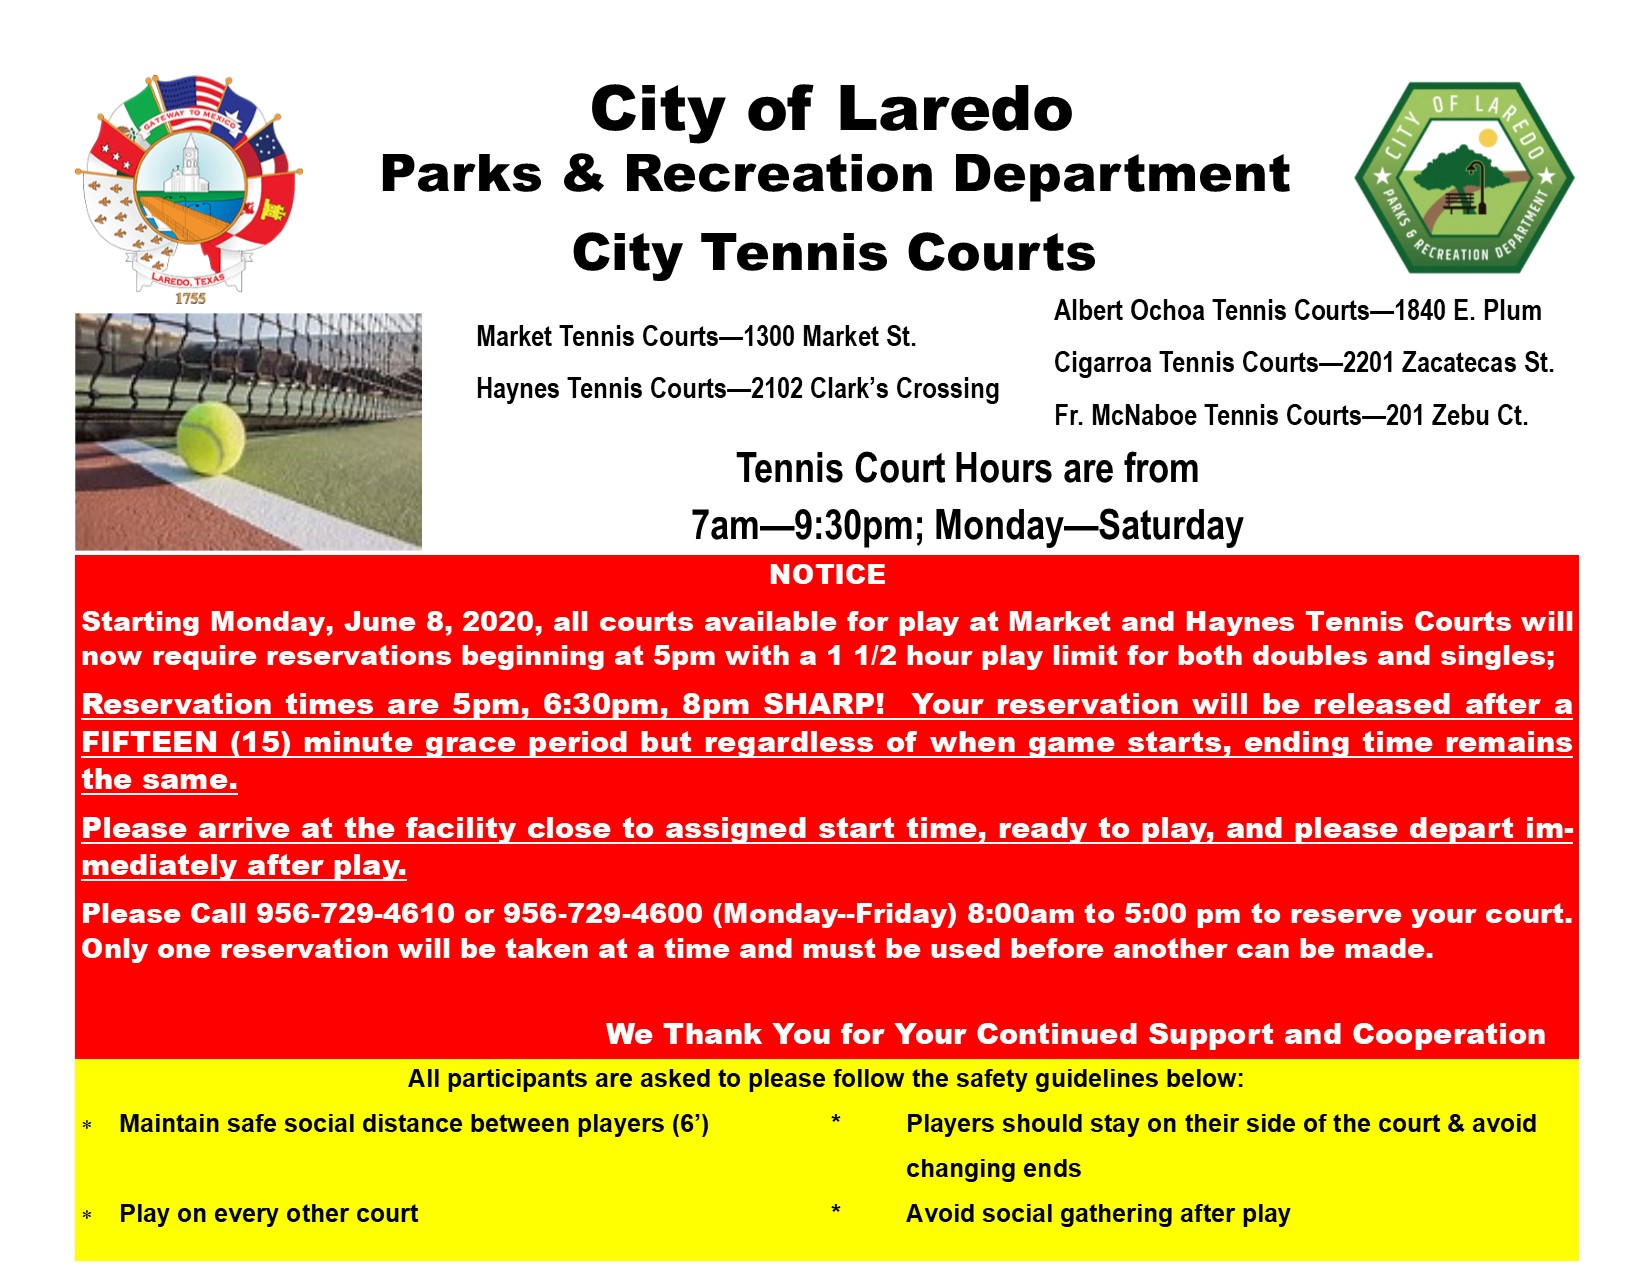 City Tennis Courts